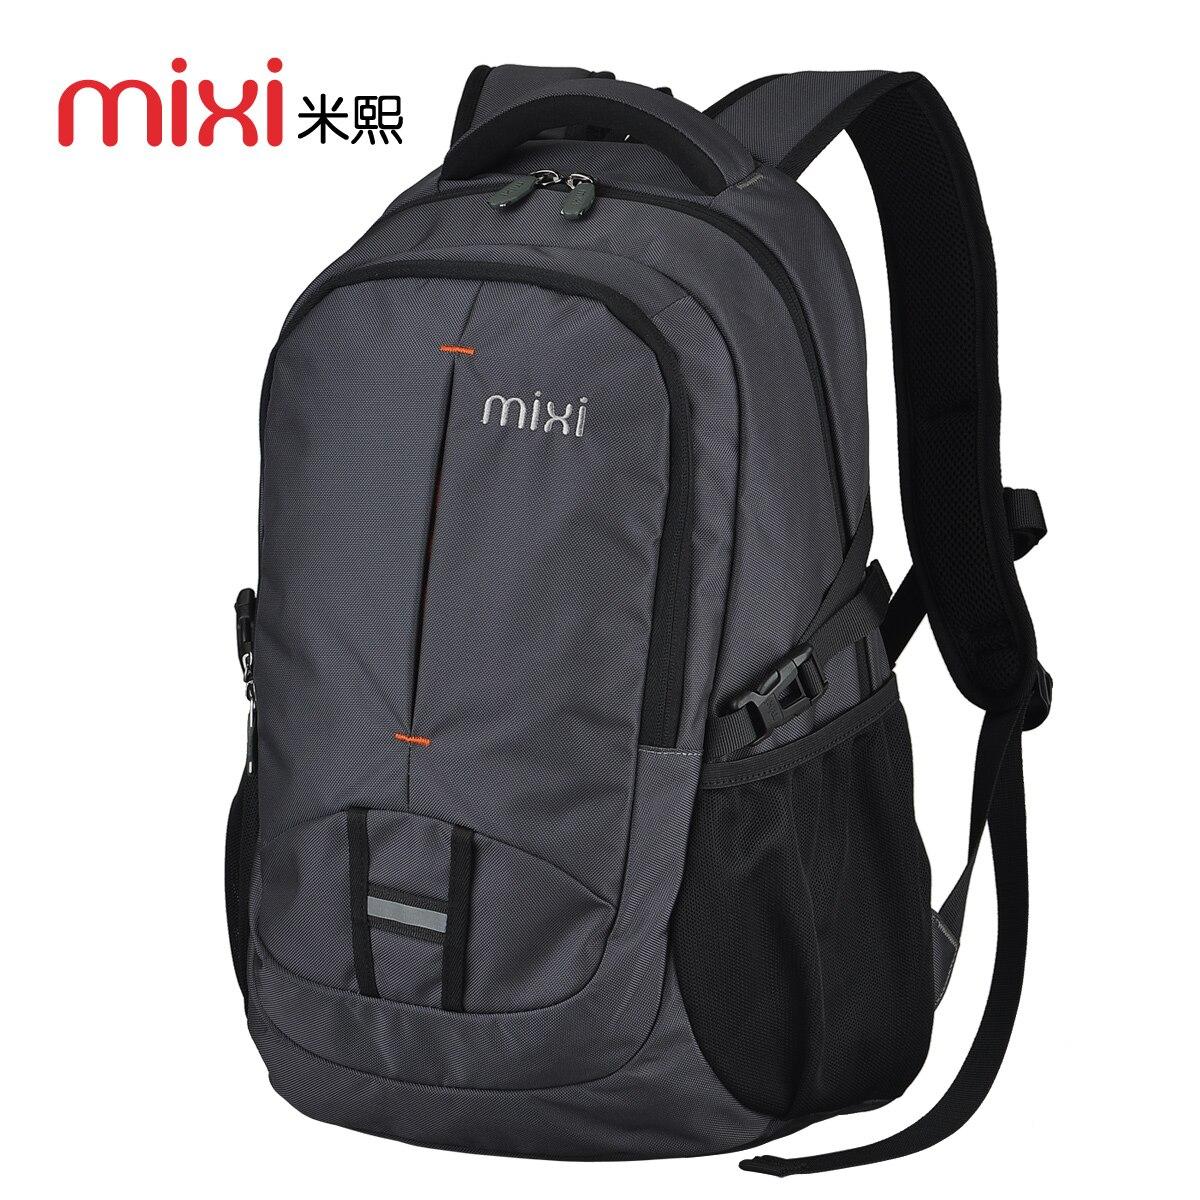 Gym Bag Jansport: Fashion Women & Men Gym Travel School Daily Backpack Bag